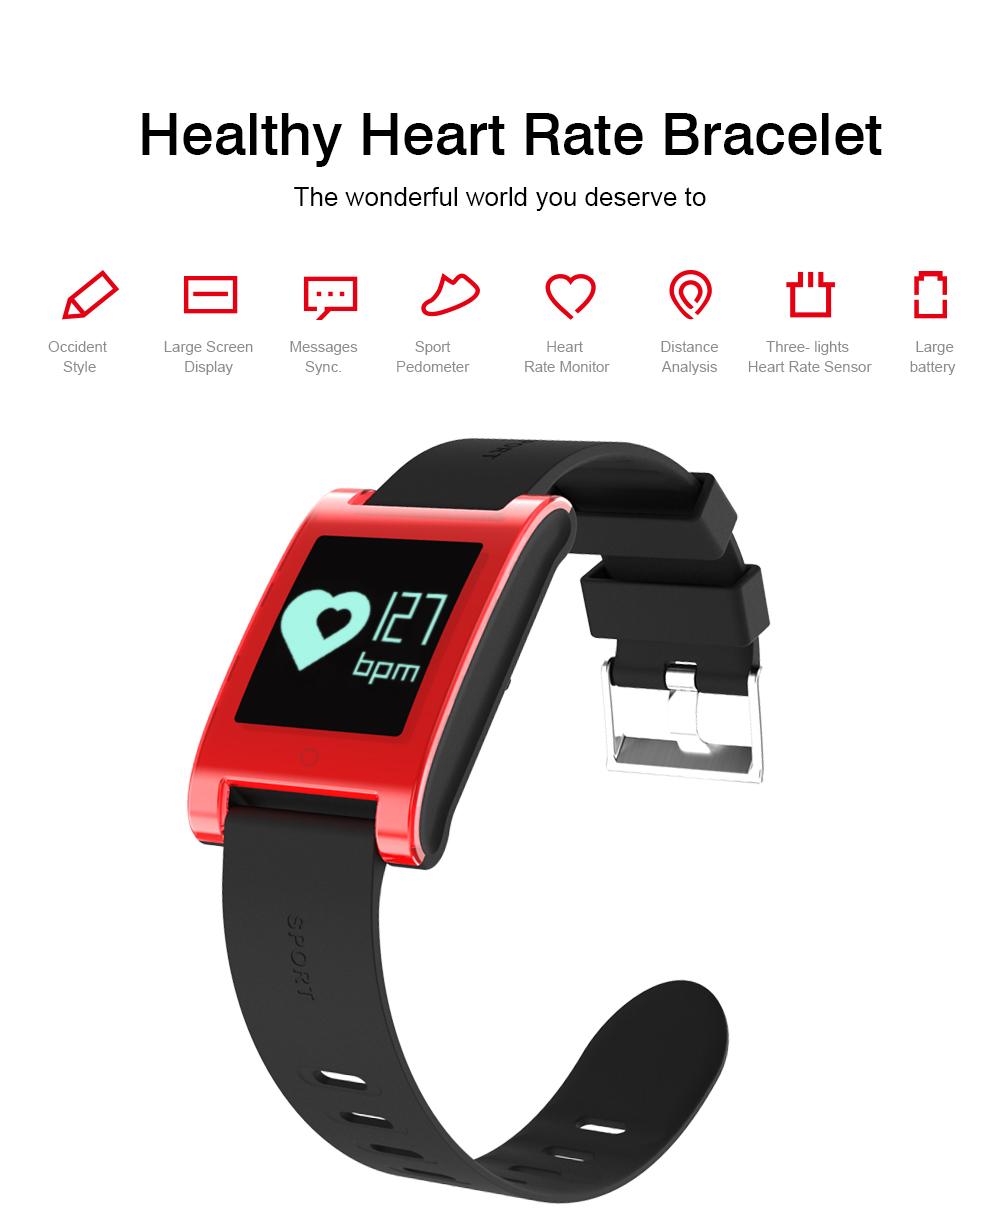 FREZEN Smart Bracelet DM68 Smart Band Fitness Sleep Activity Tracker Blood Pressure Oxygen Heart Rate Tracker For Android IOS 2